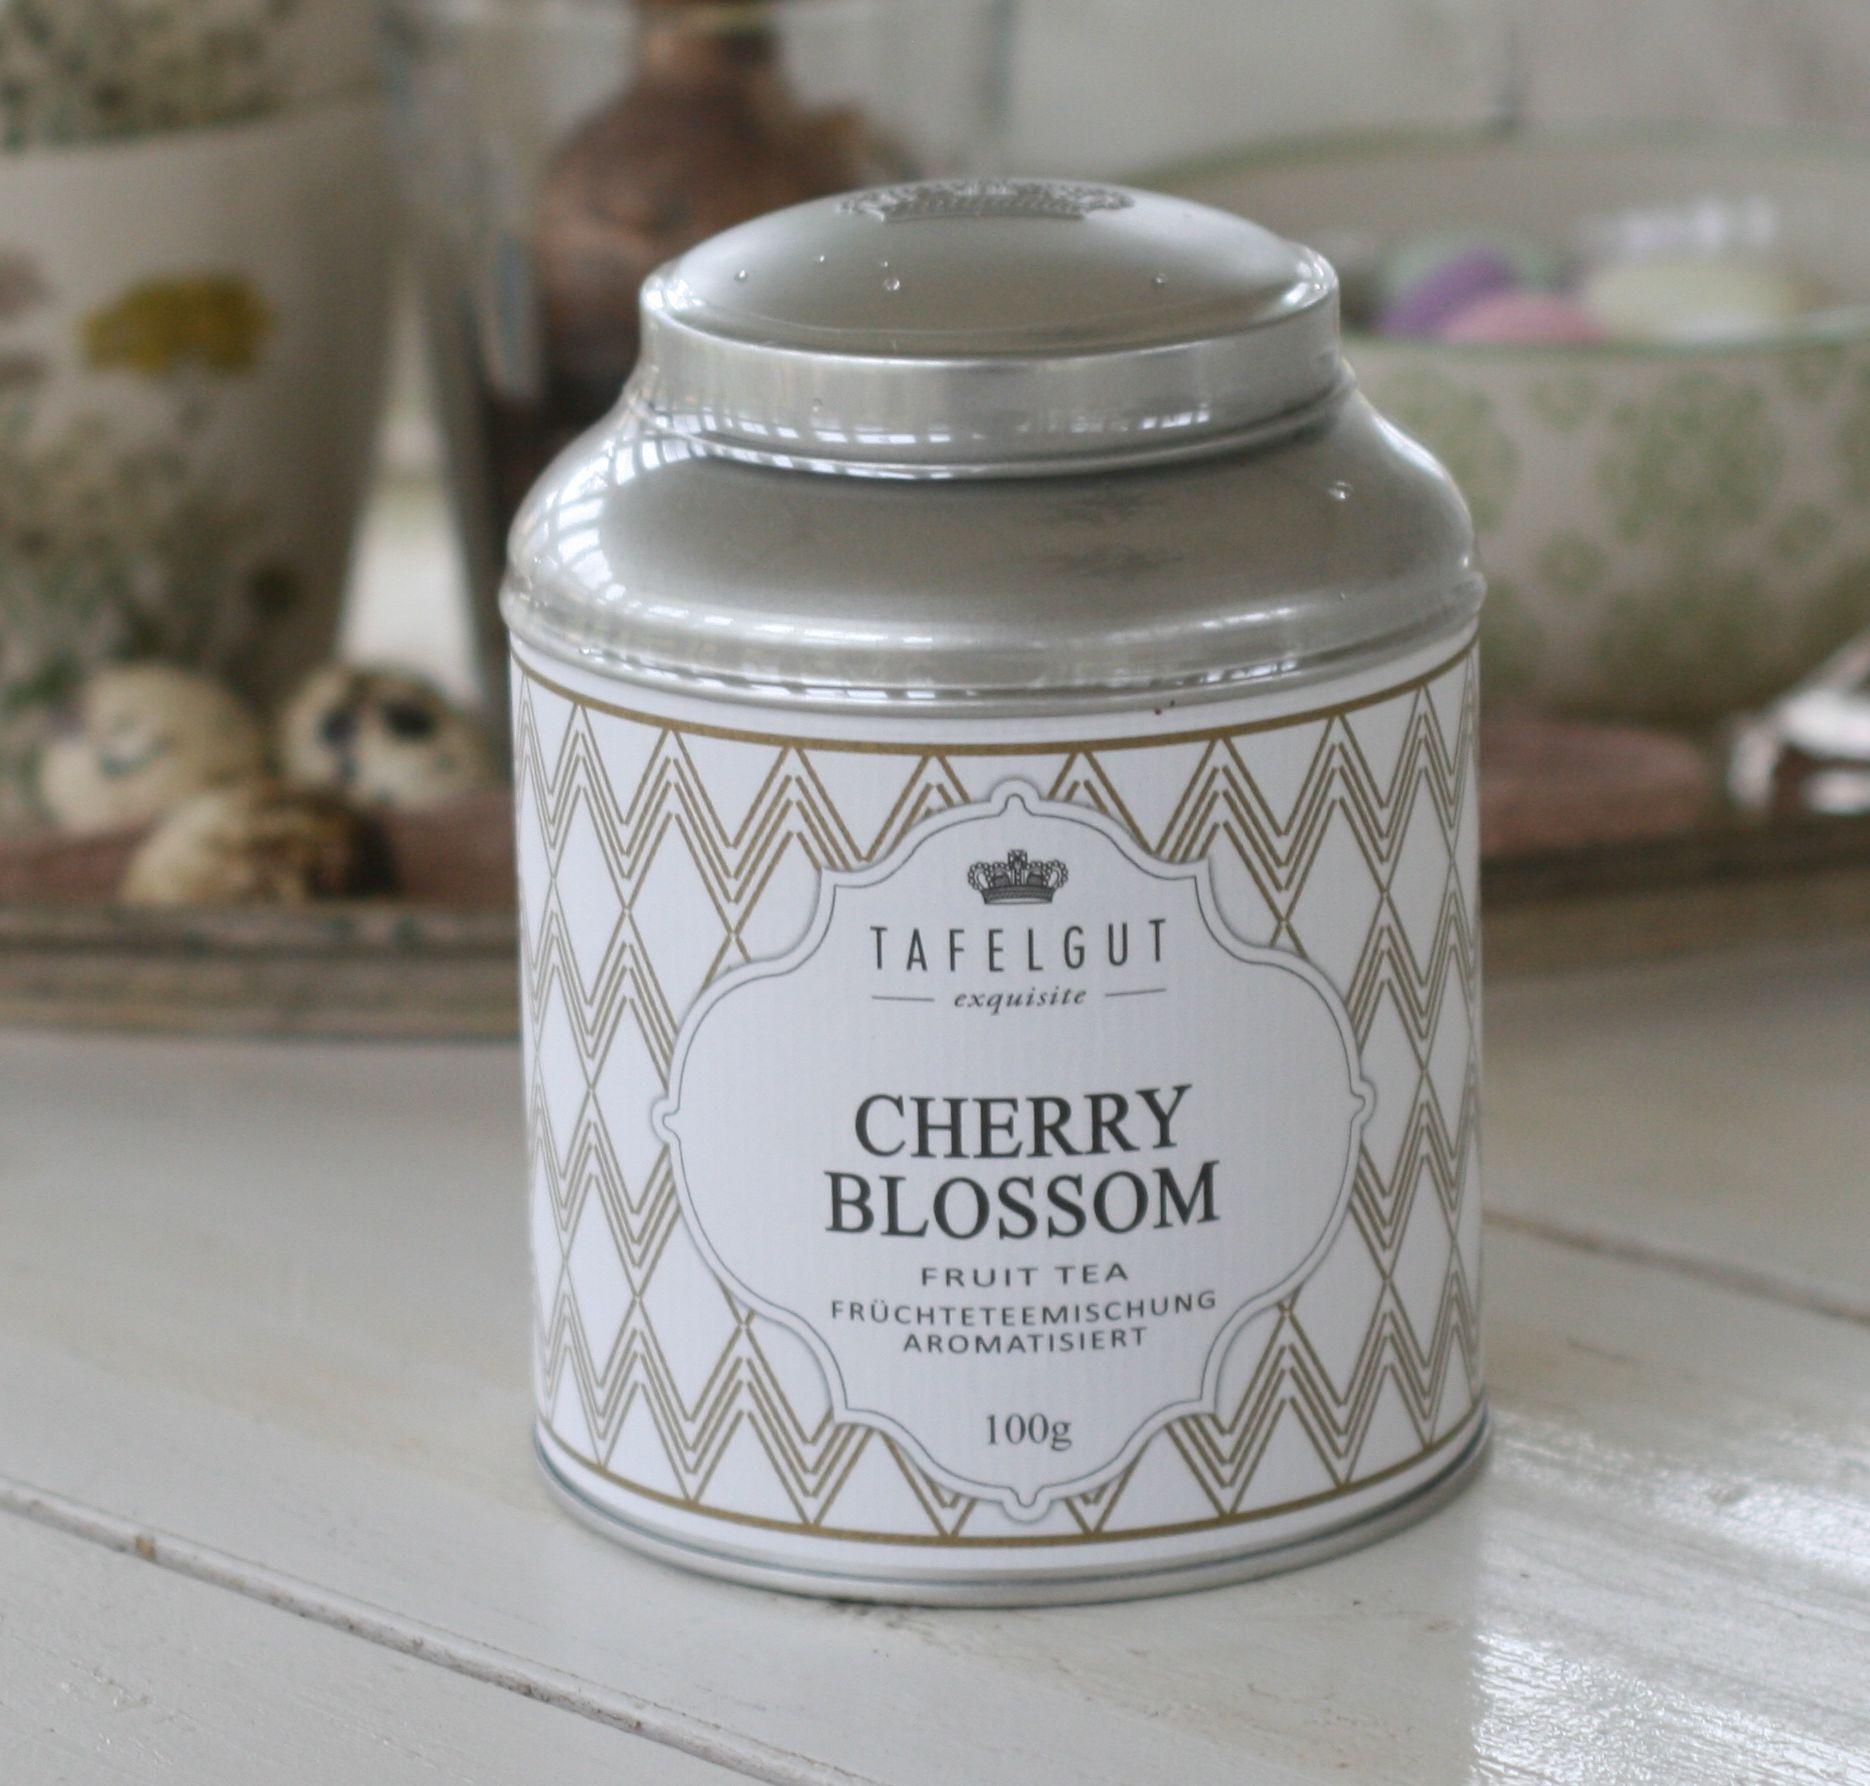 Tafelgut - Cherry Blossom tea